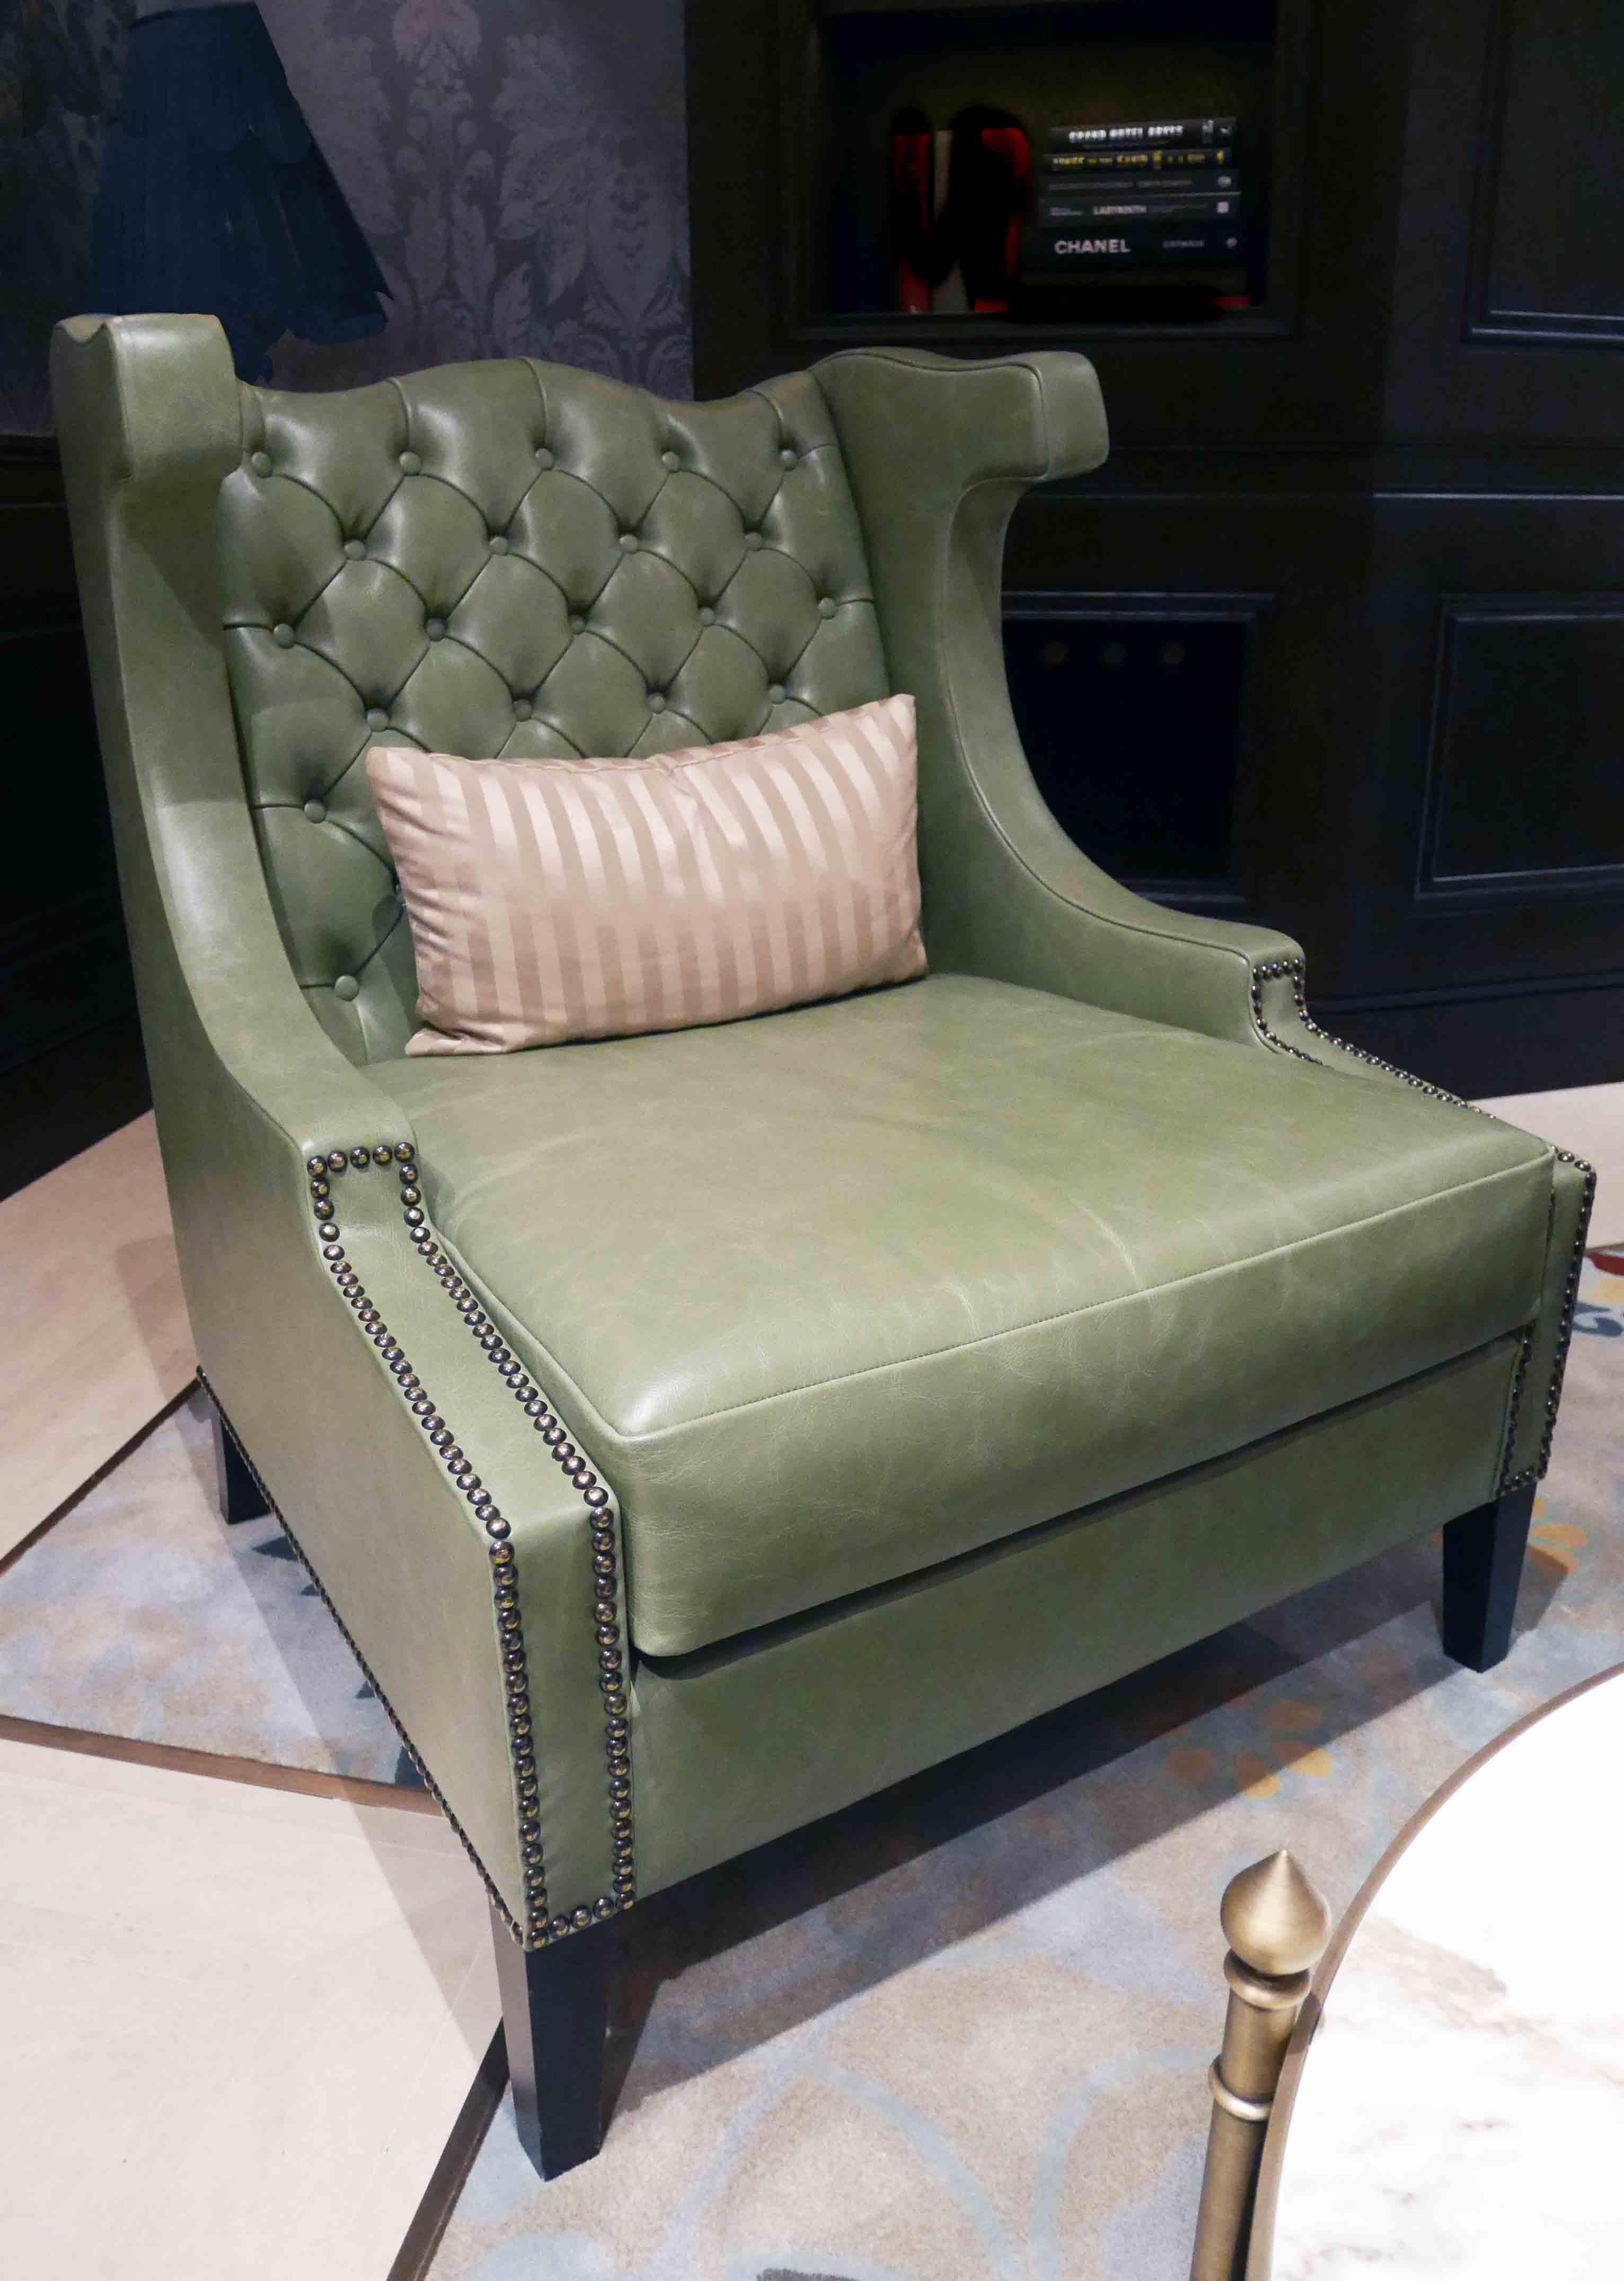 Lanesborough-club-spa-decca-london-luxury-furniture-lounge-chair